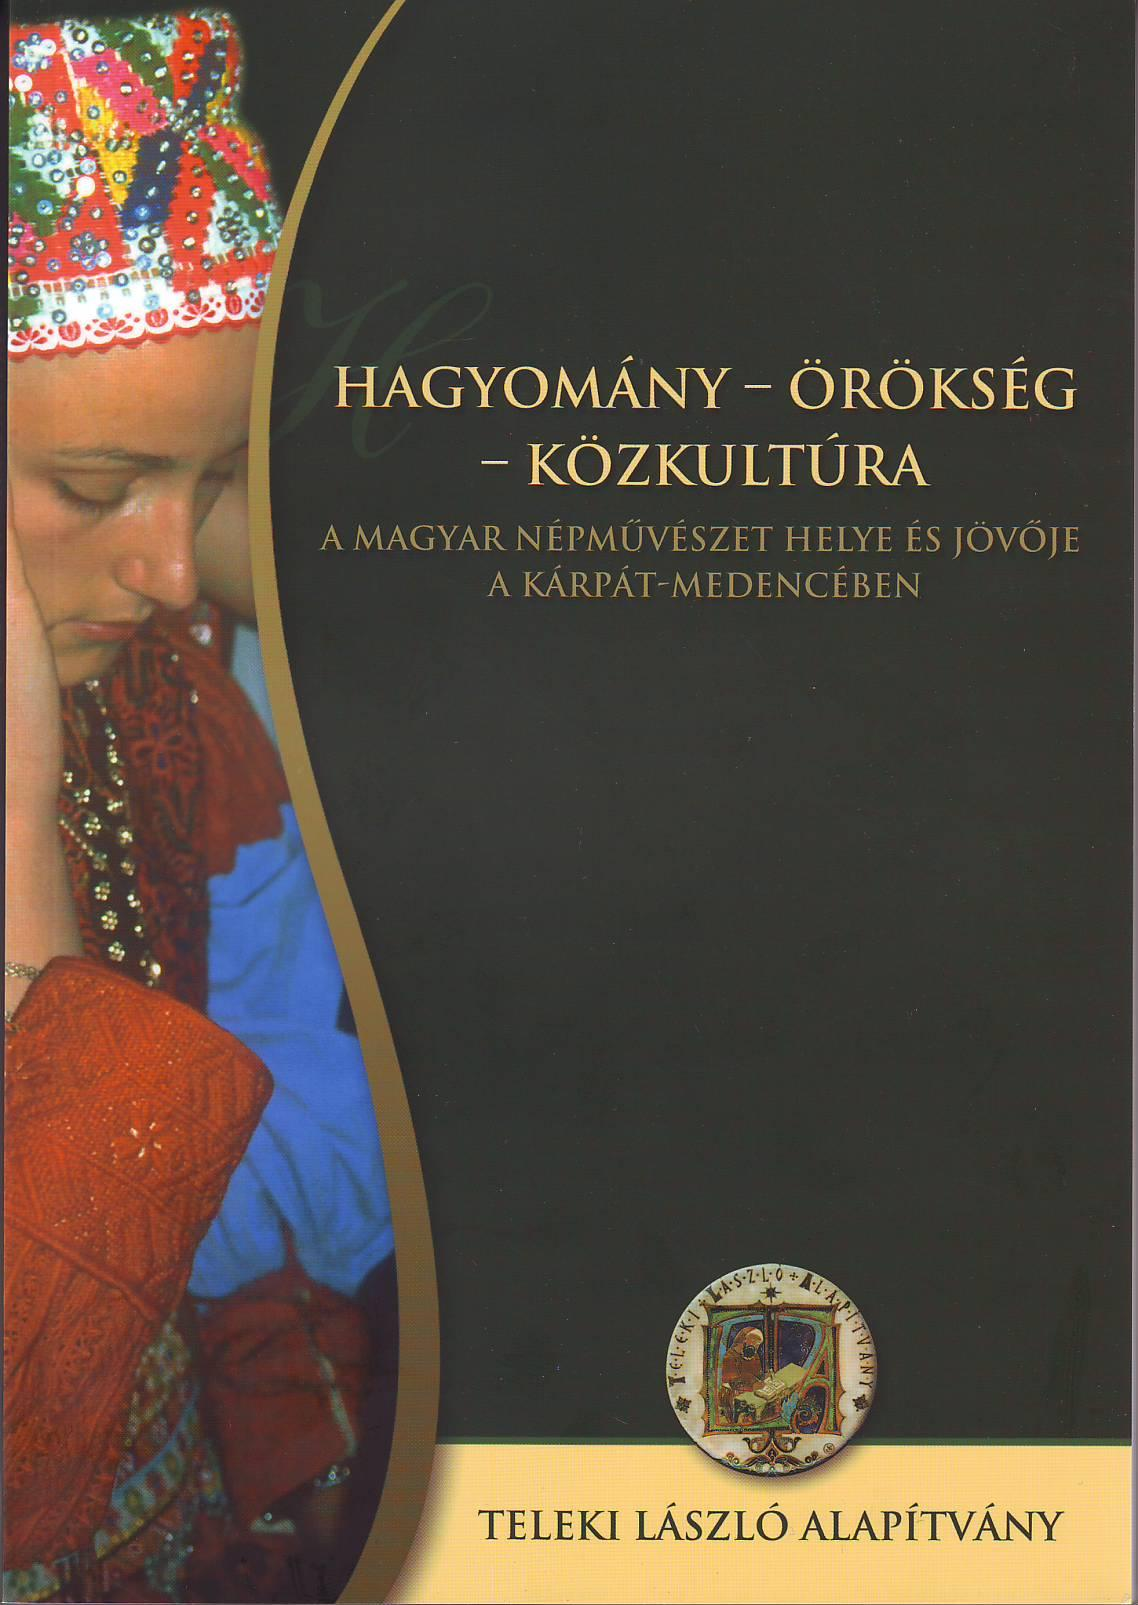 HAGYOMÁNY - ÖRÖKSÉG - KÖZKULTÚRA